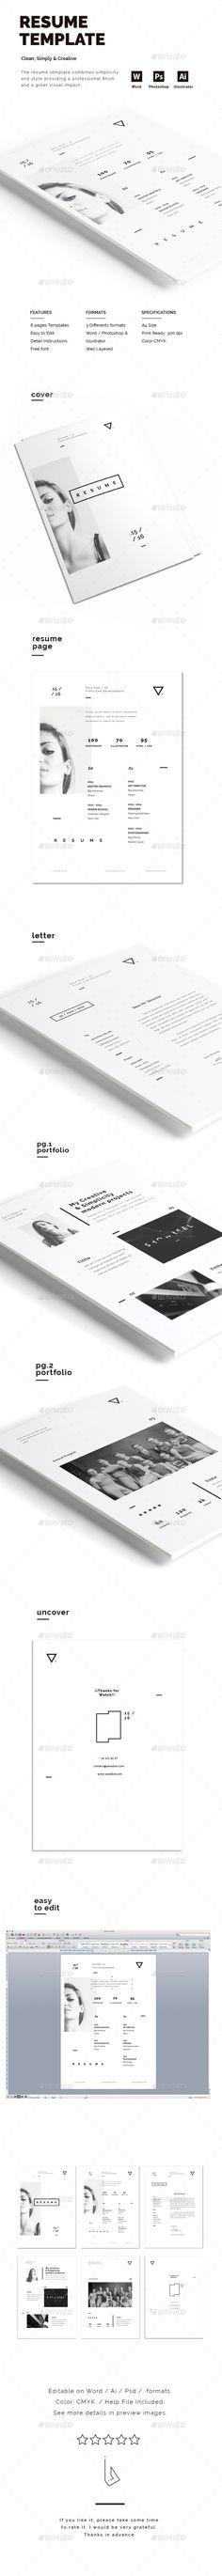 Keisha Resume Colors, Belize and Resume - killer resume template